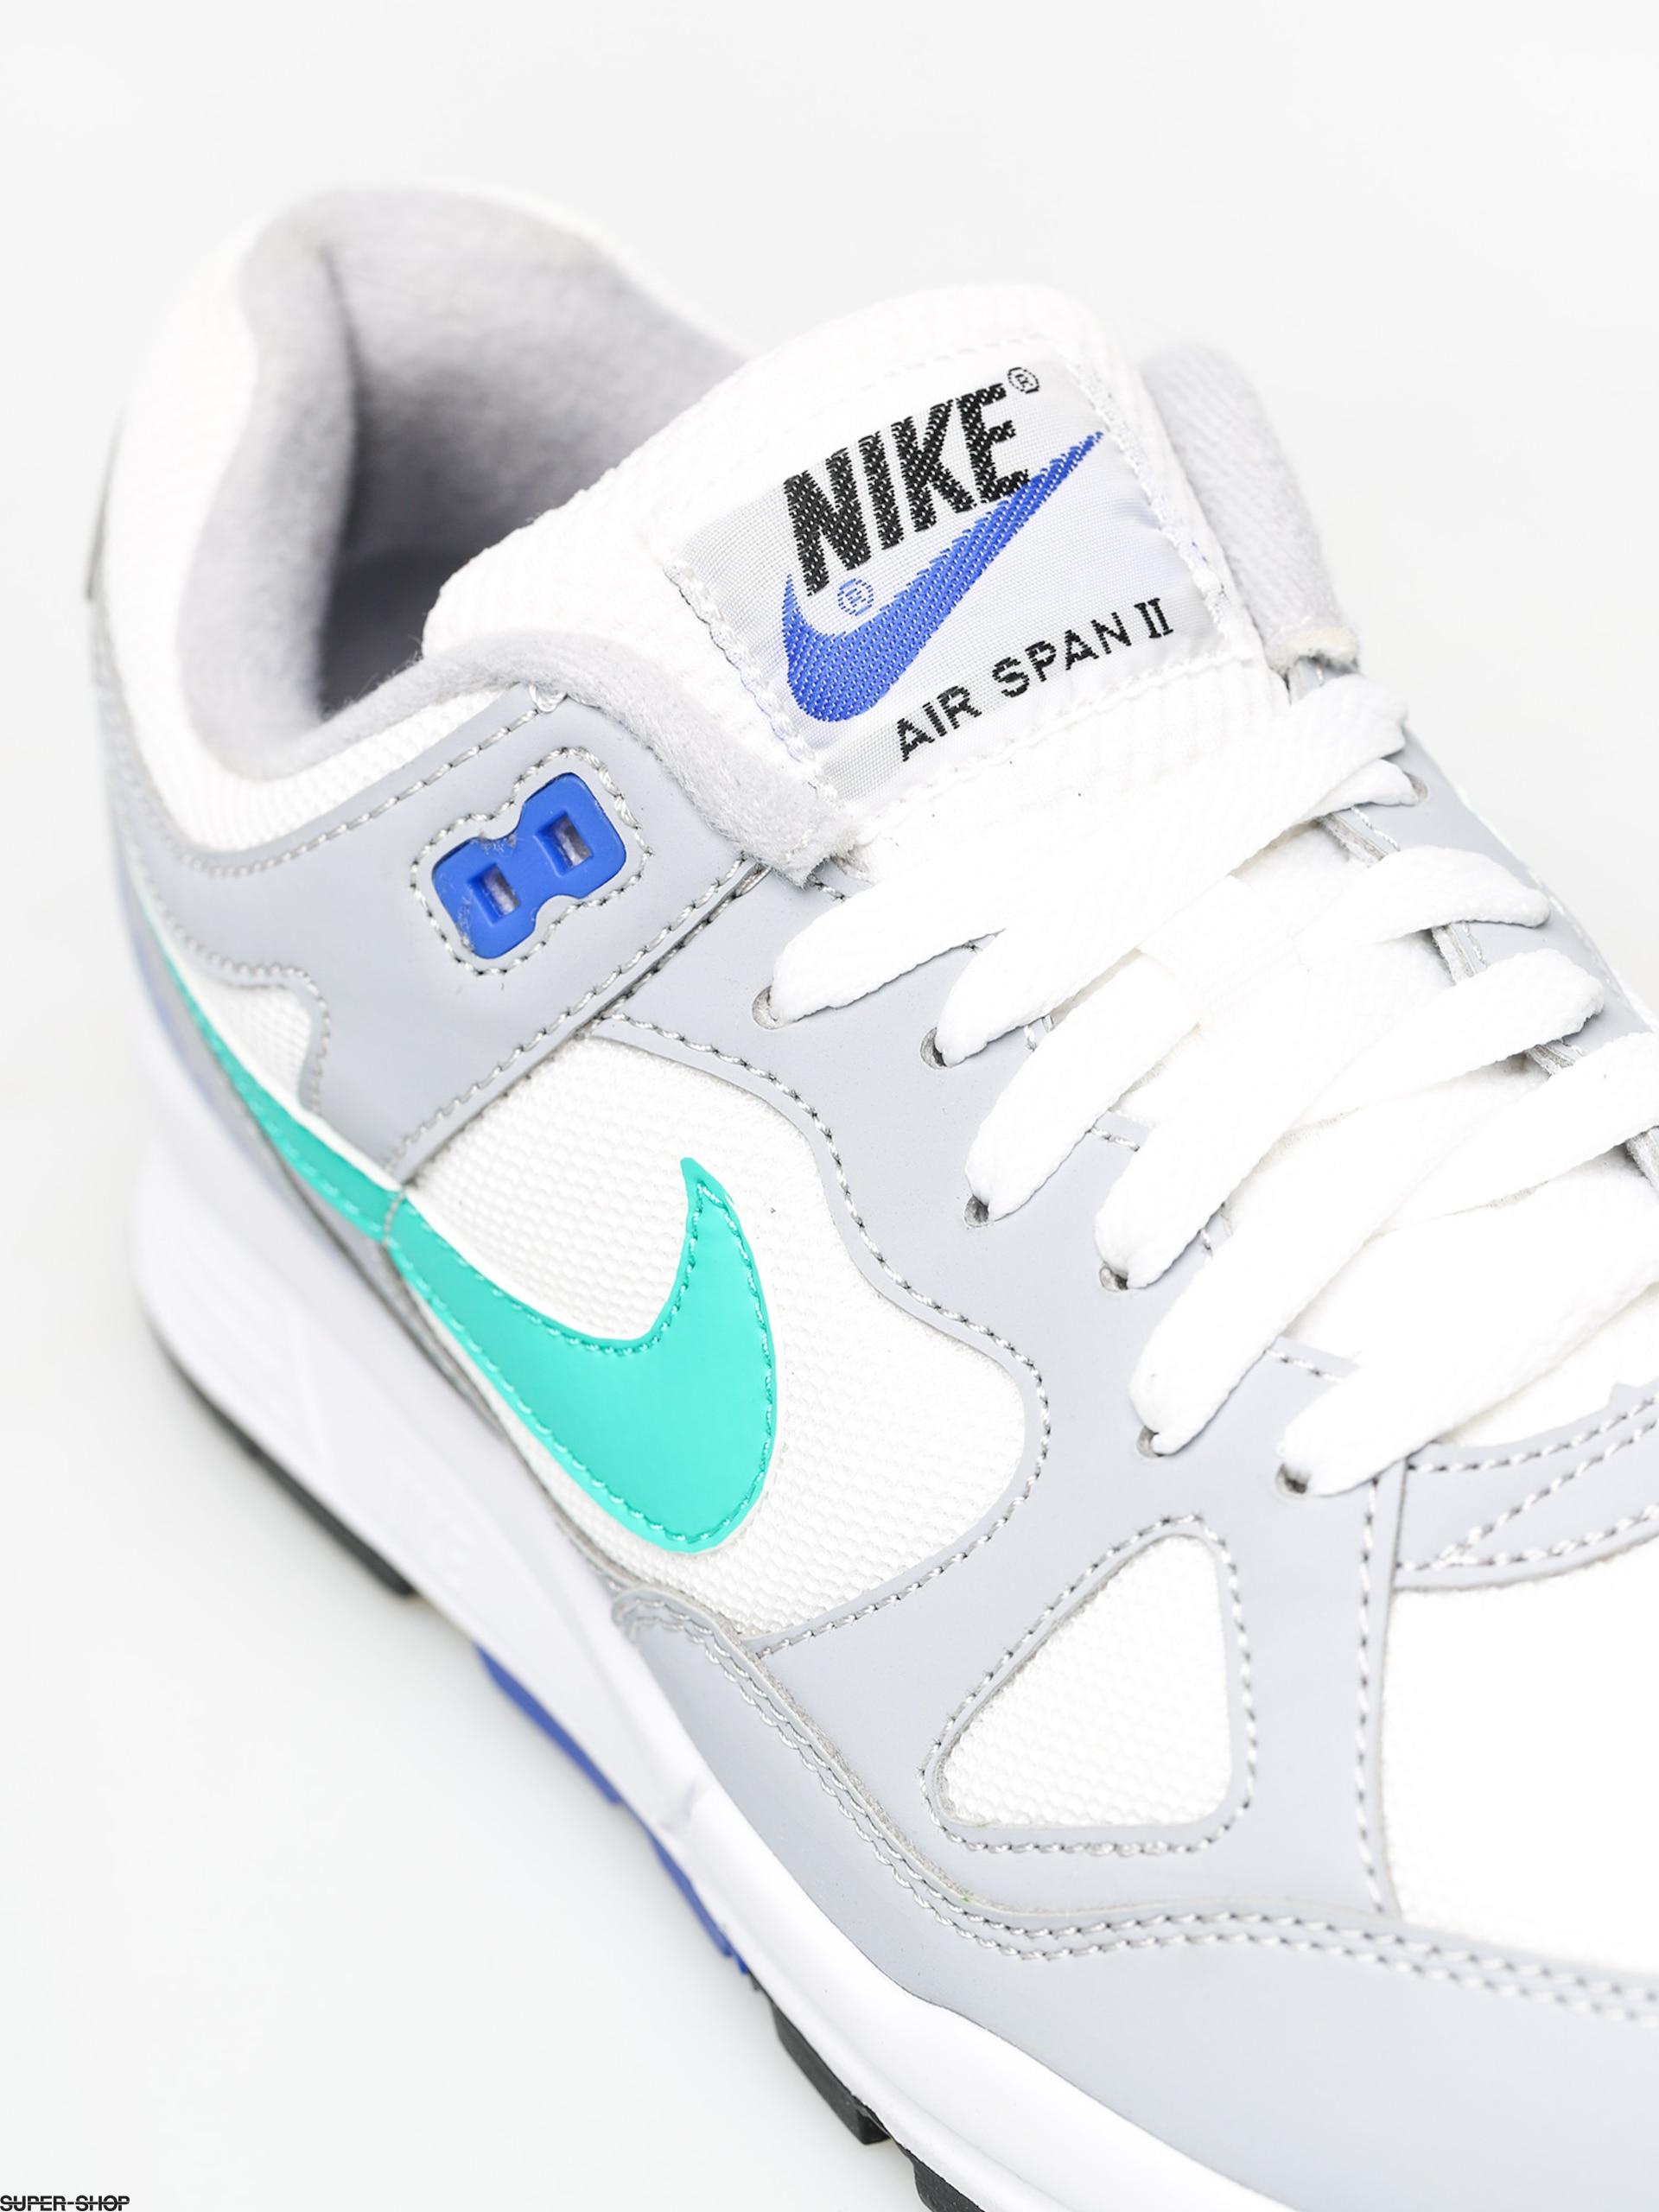 nike AIR SPAN II WOLF GREYCLEAR EMERALD WHITE RACER BLUE bei